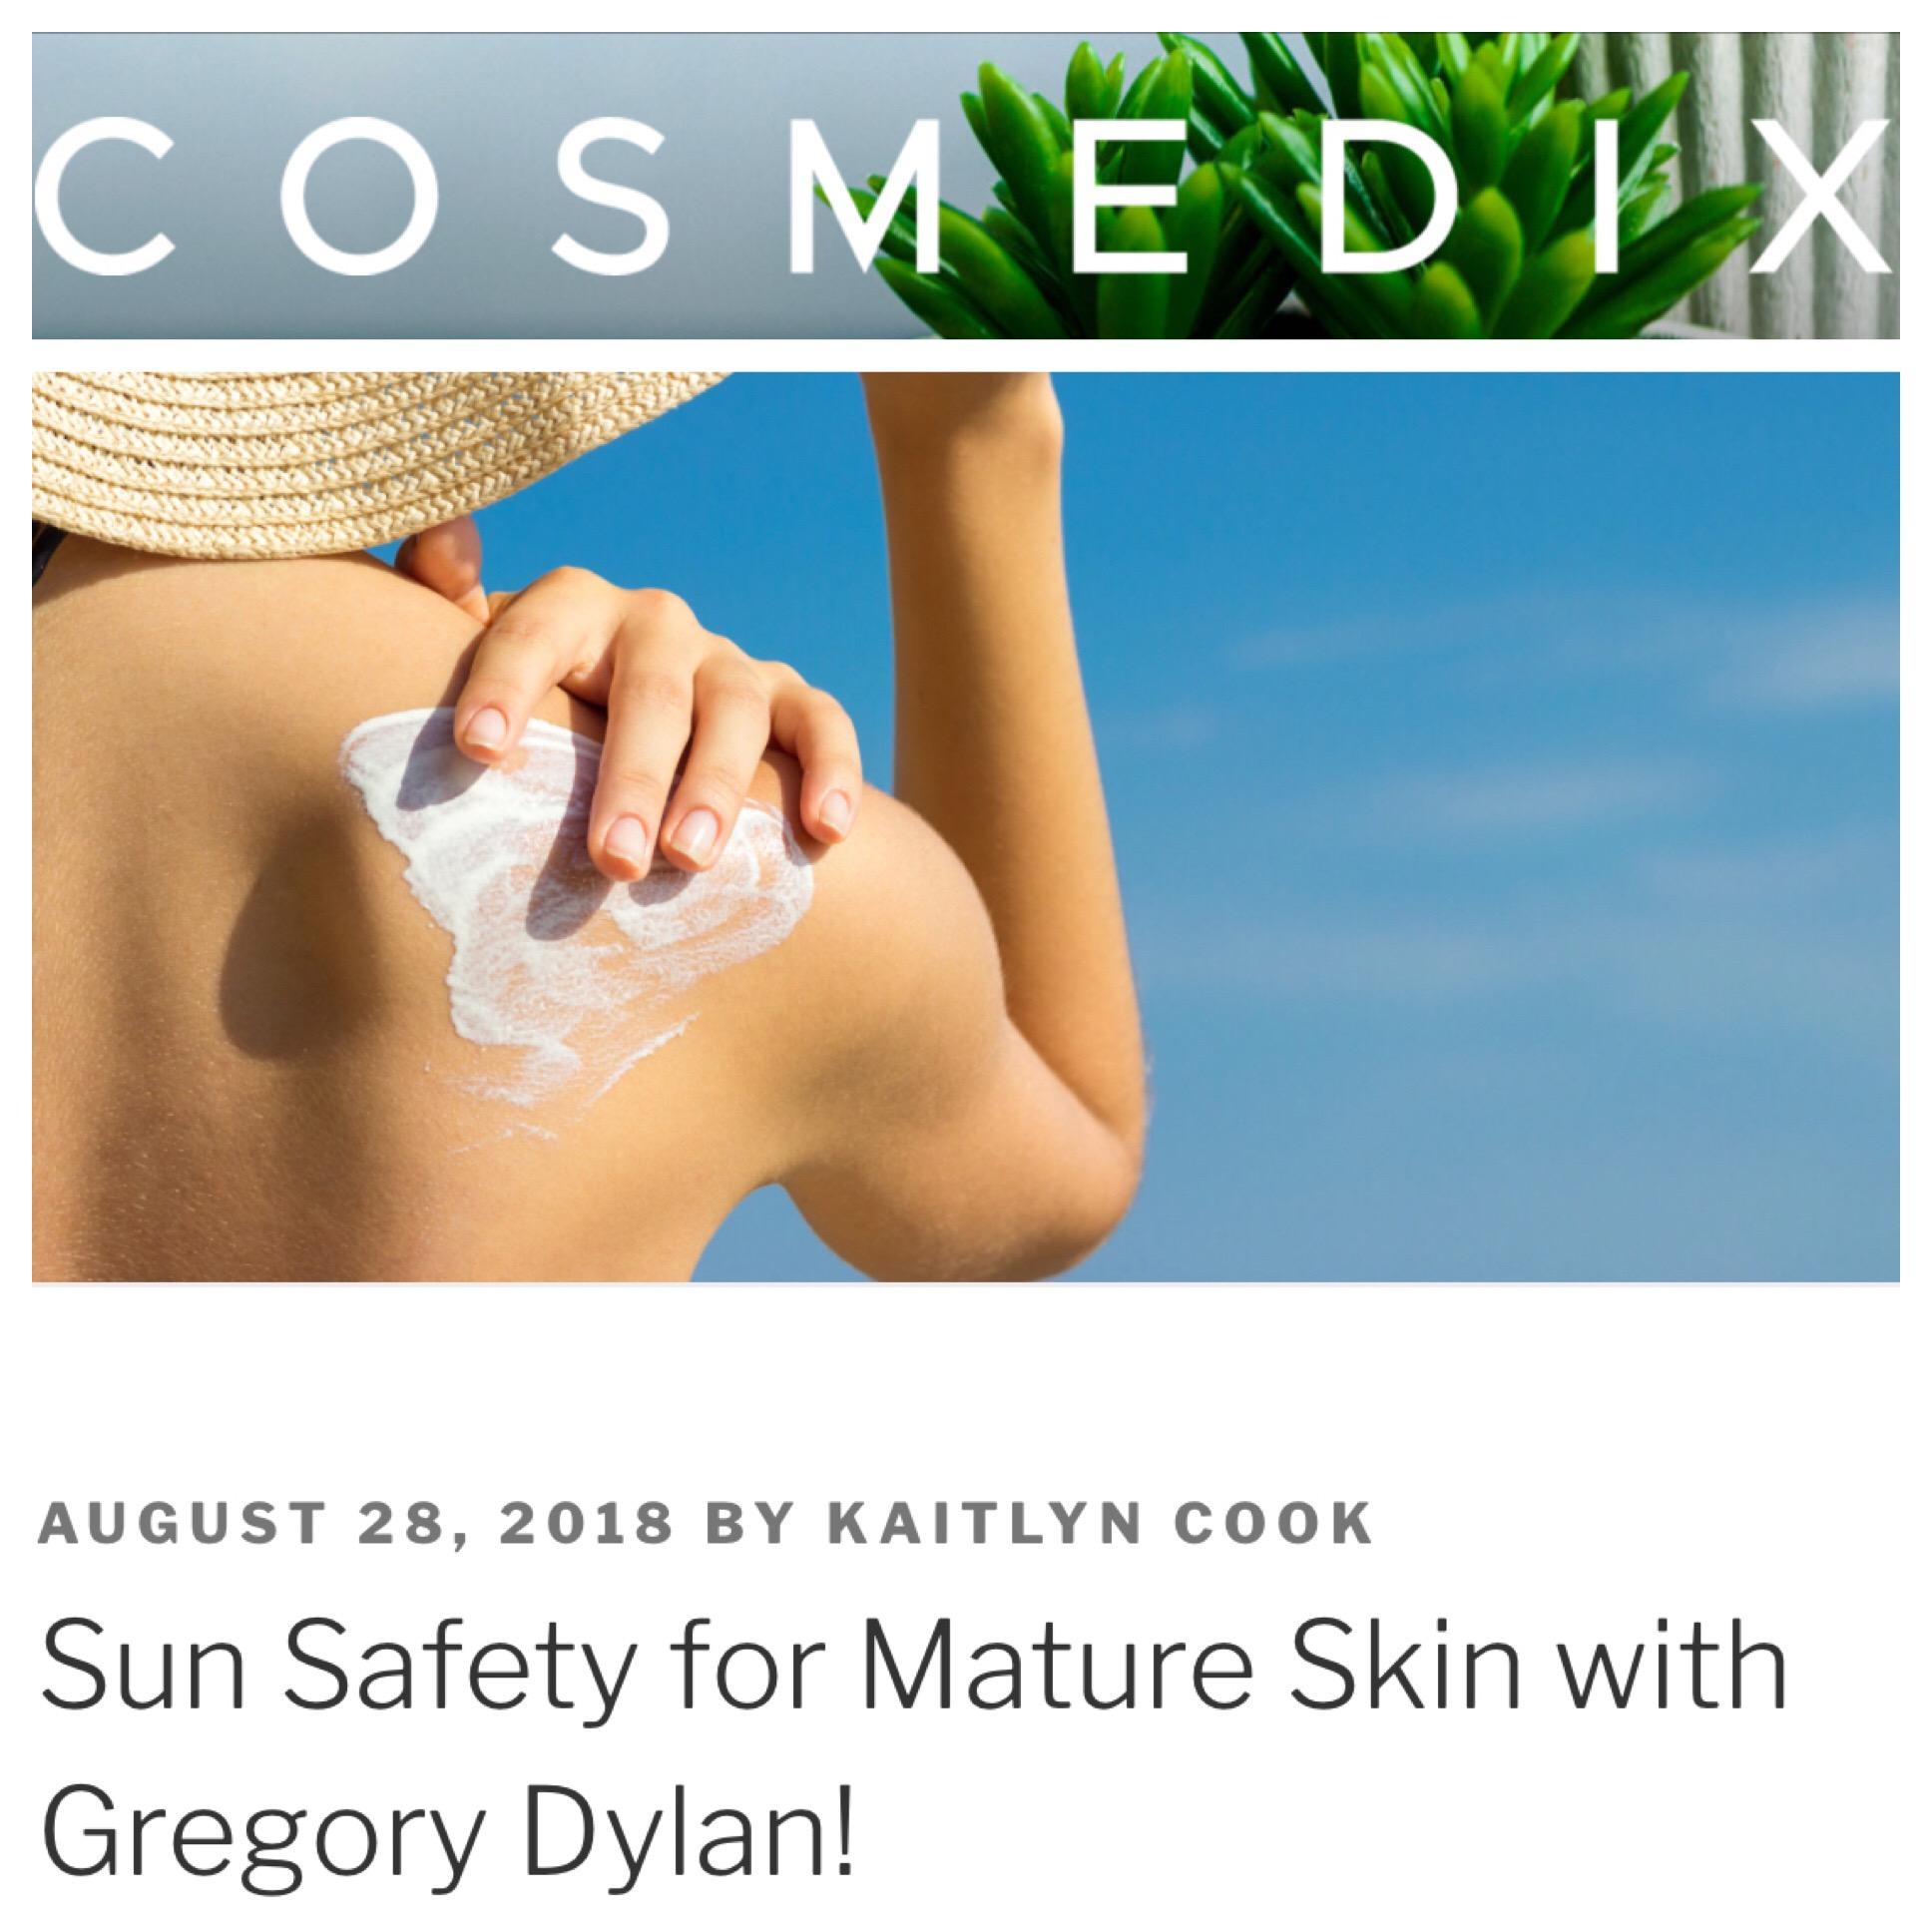 Gregory Dylan on COSMEDIX Blog!